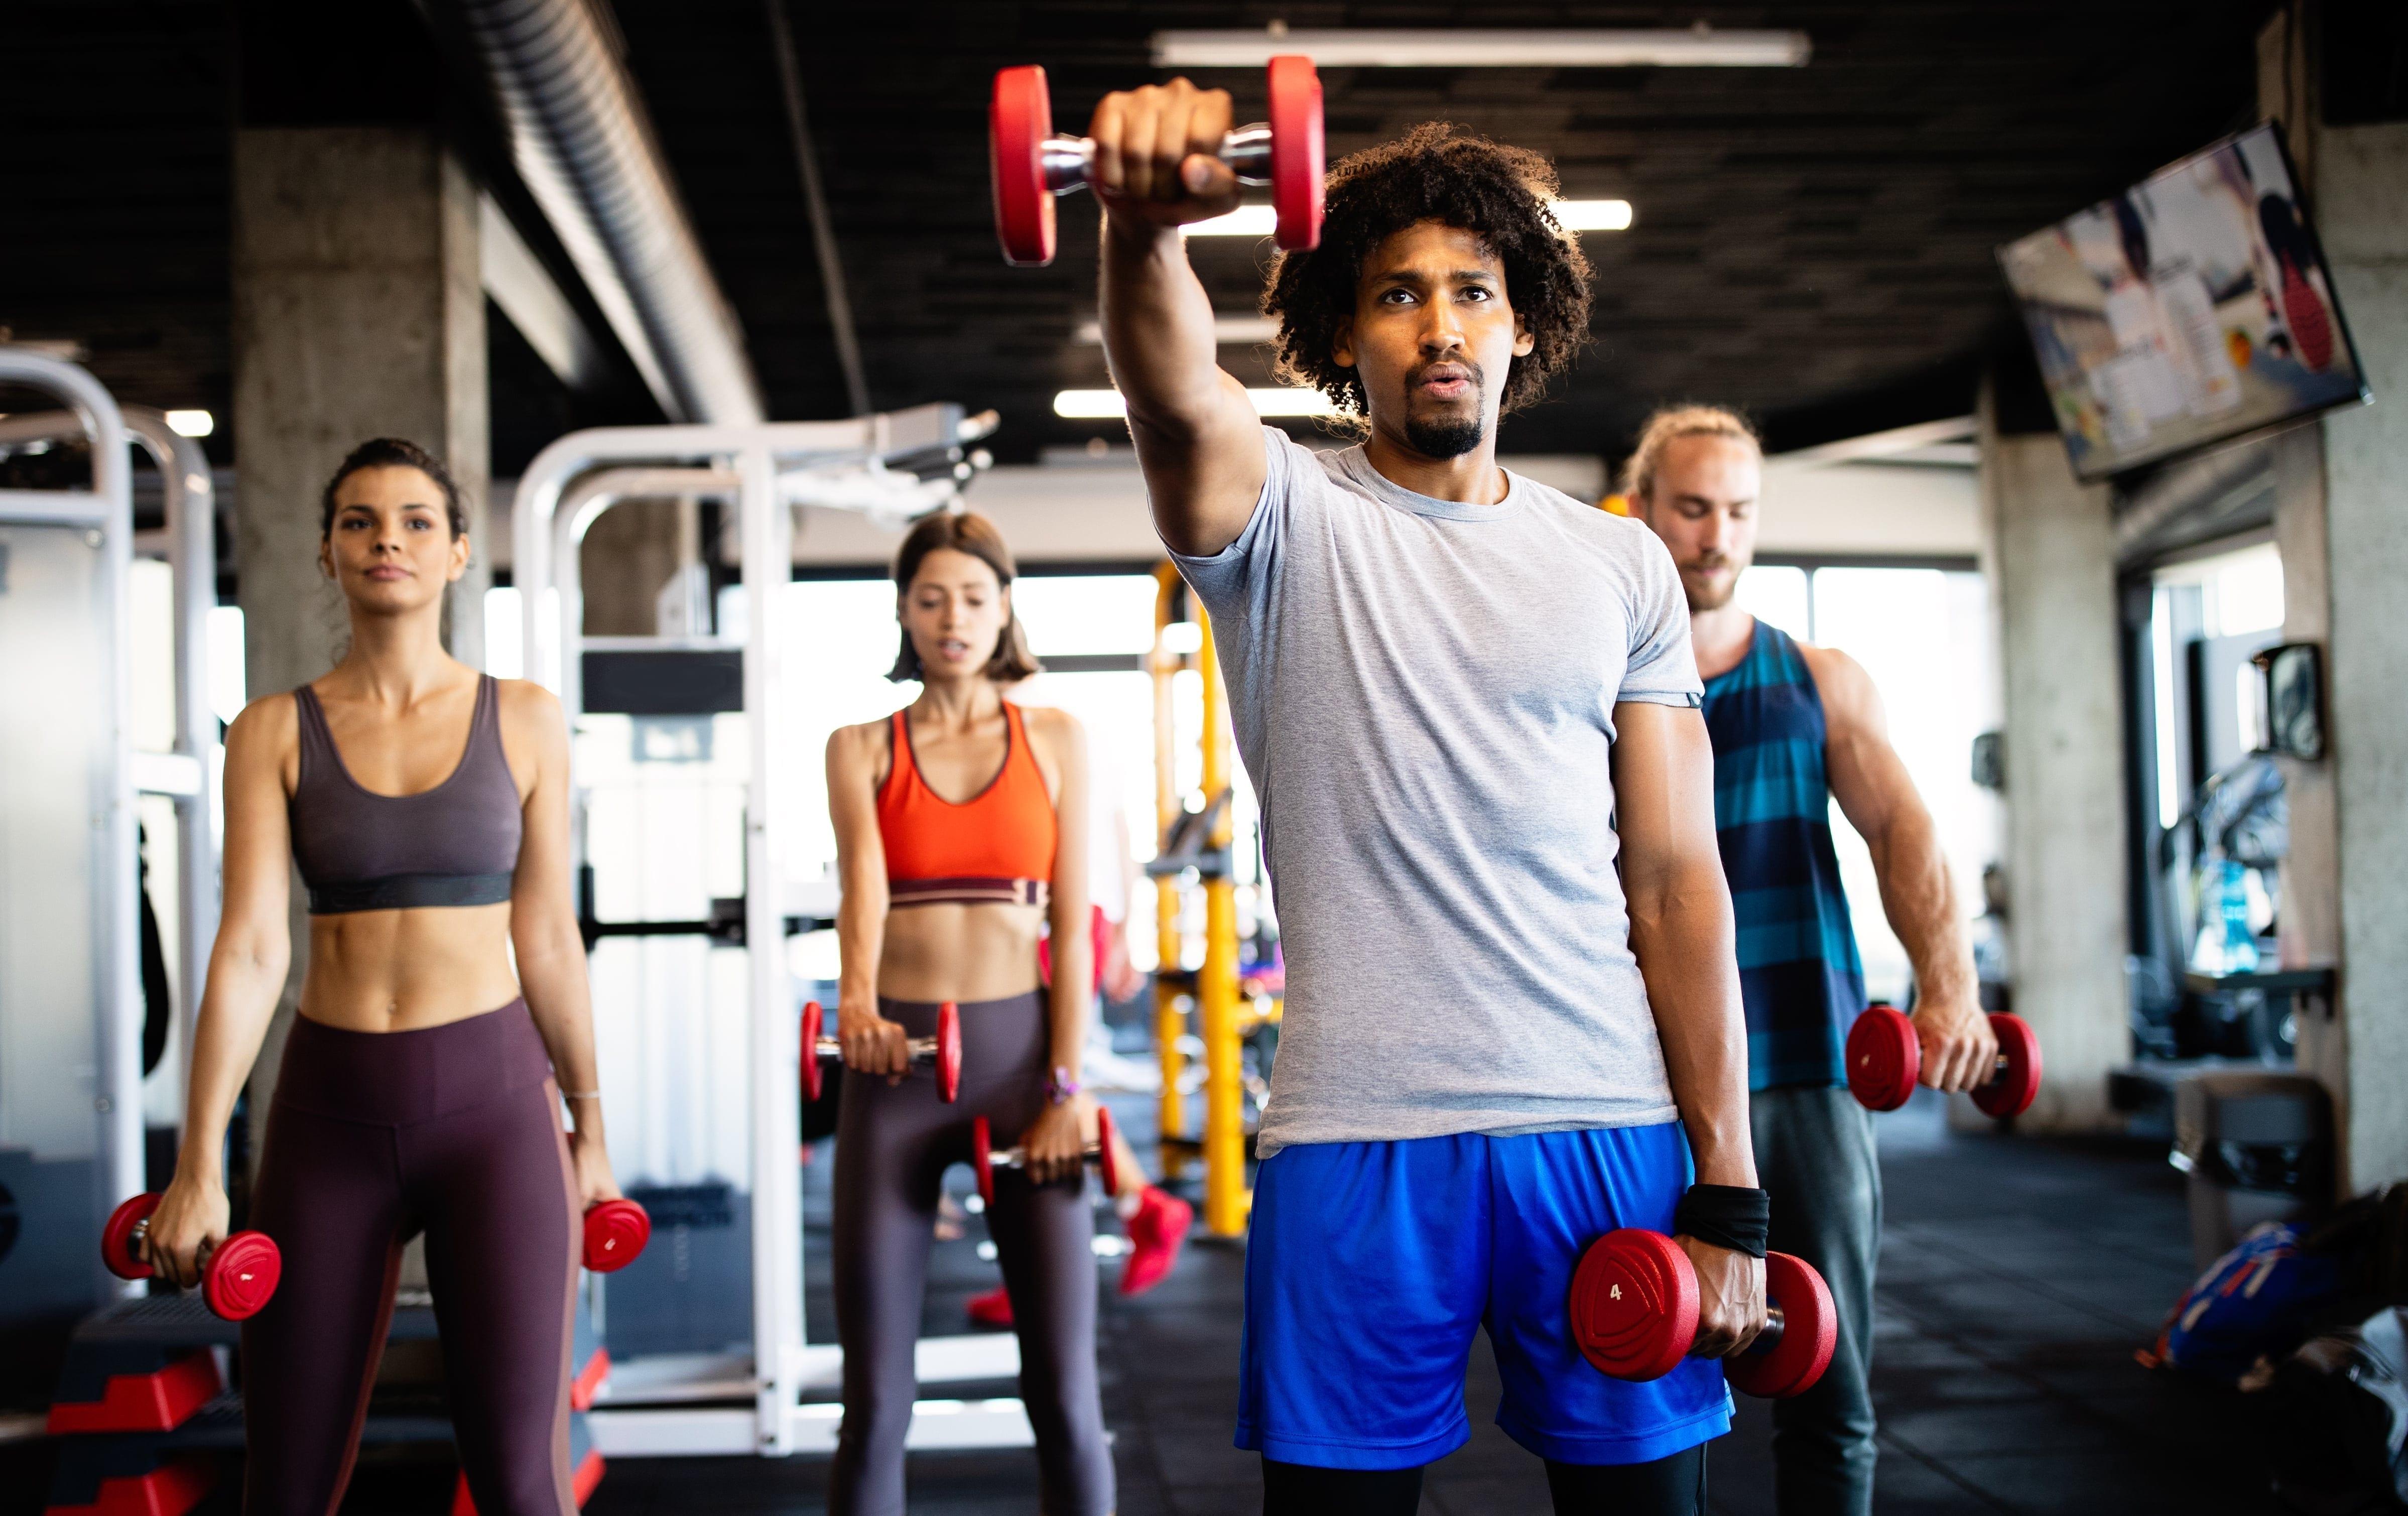 Group of athletes who use CBD for athletes